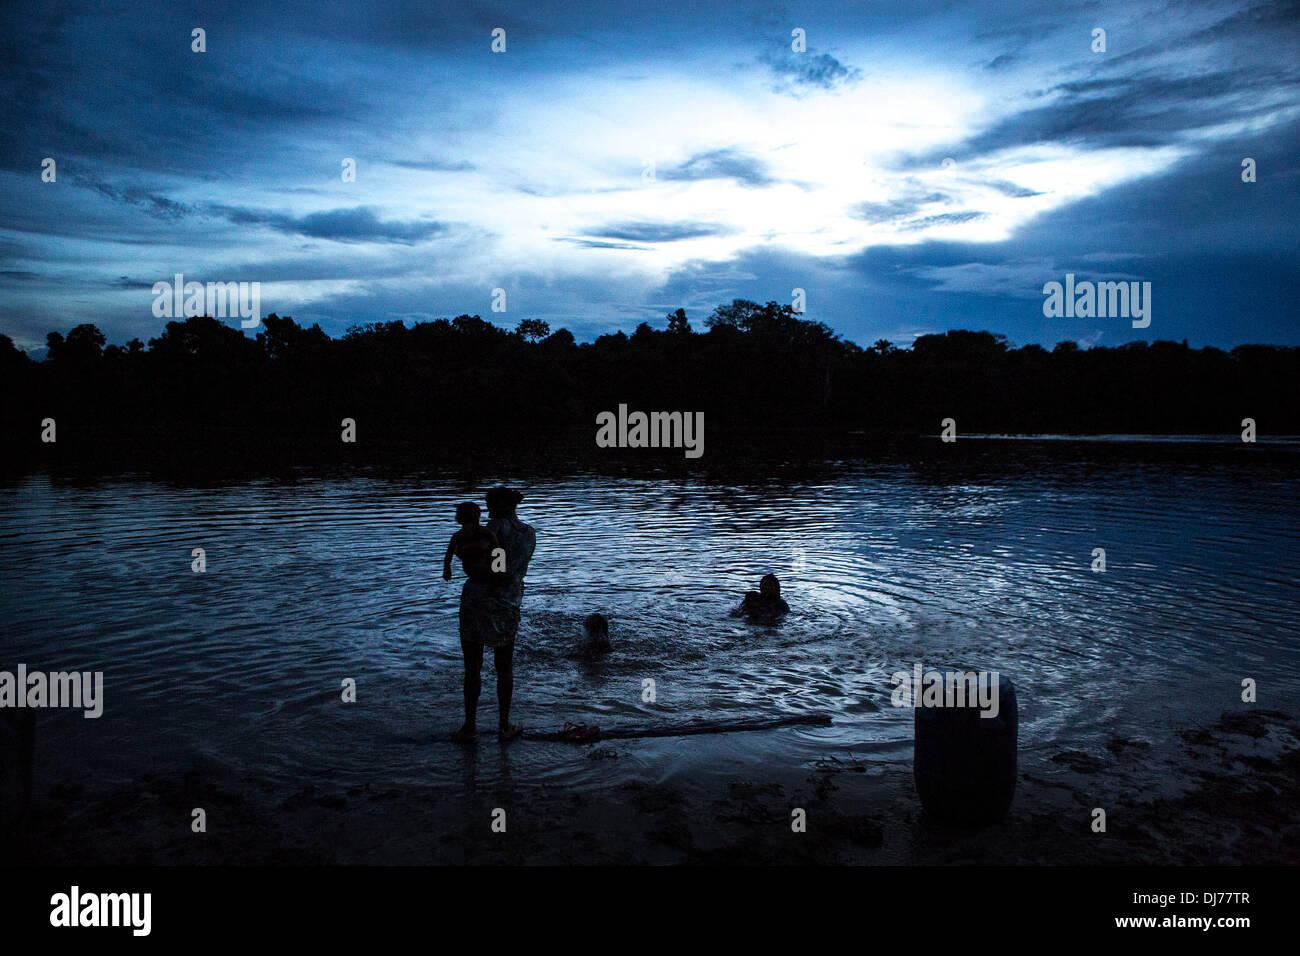 Xingu Tribe Stock Photos & Xingu Tribe Stock Images - Alamy